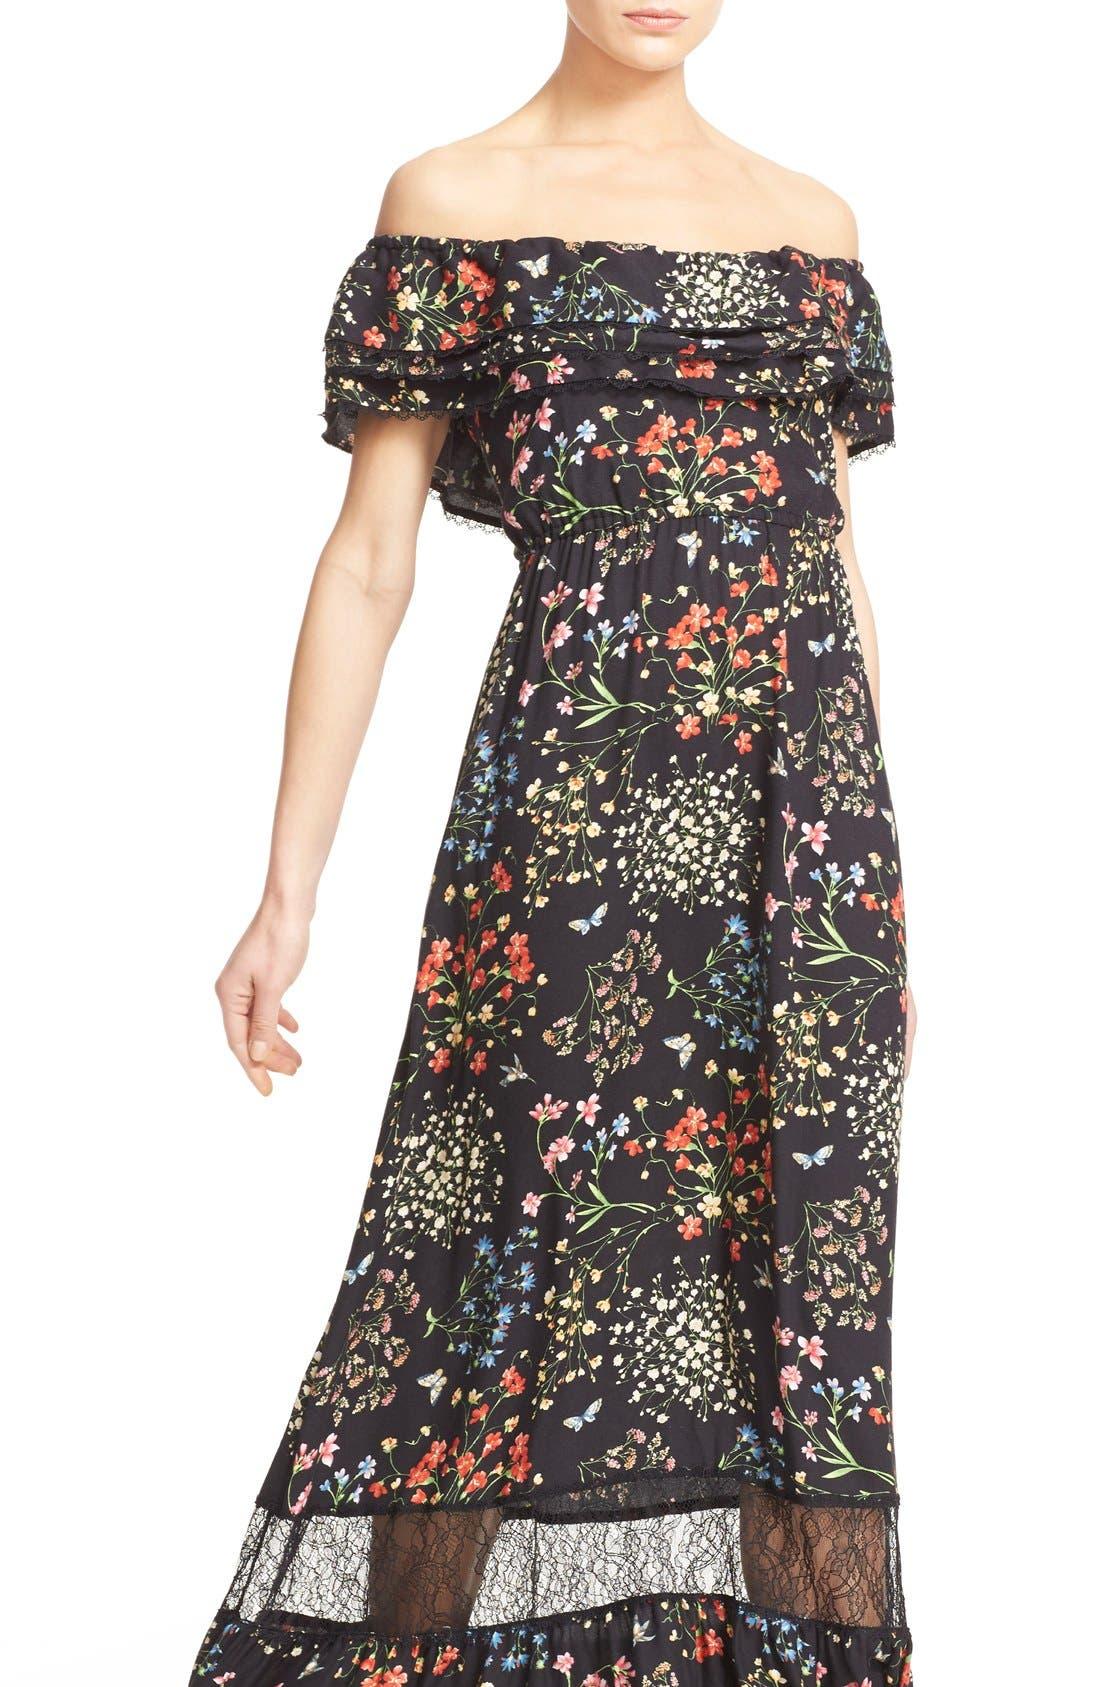 'Cheri' Floral Print Off the Shoulder Maxi Dress,                             Alternate thumbnail 6, color,                             002